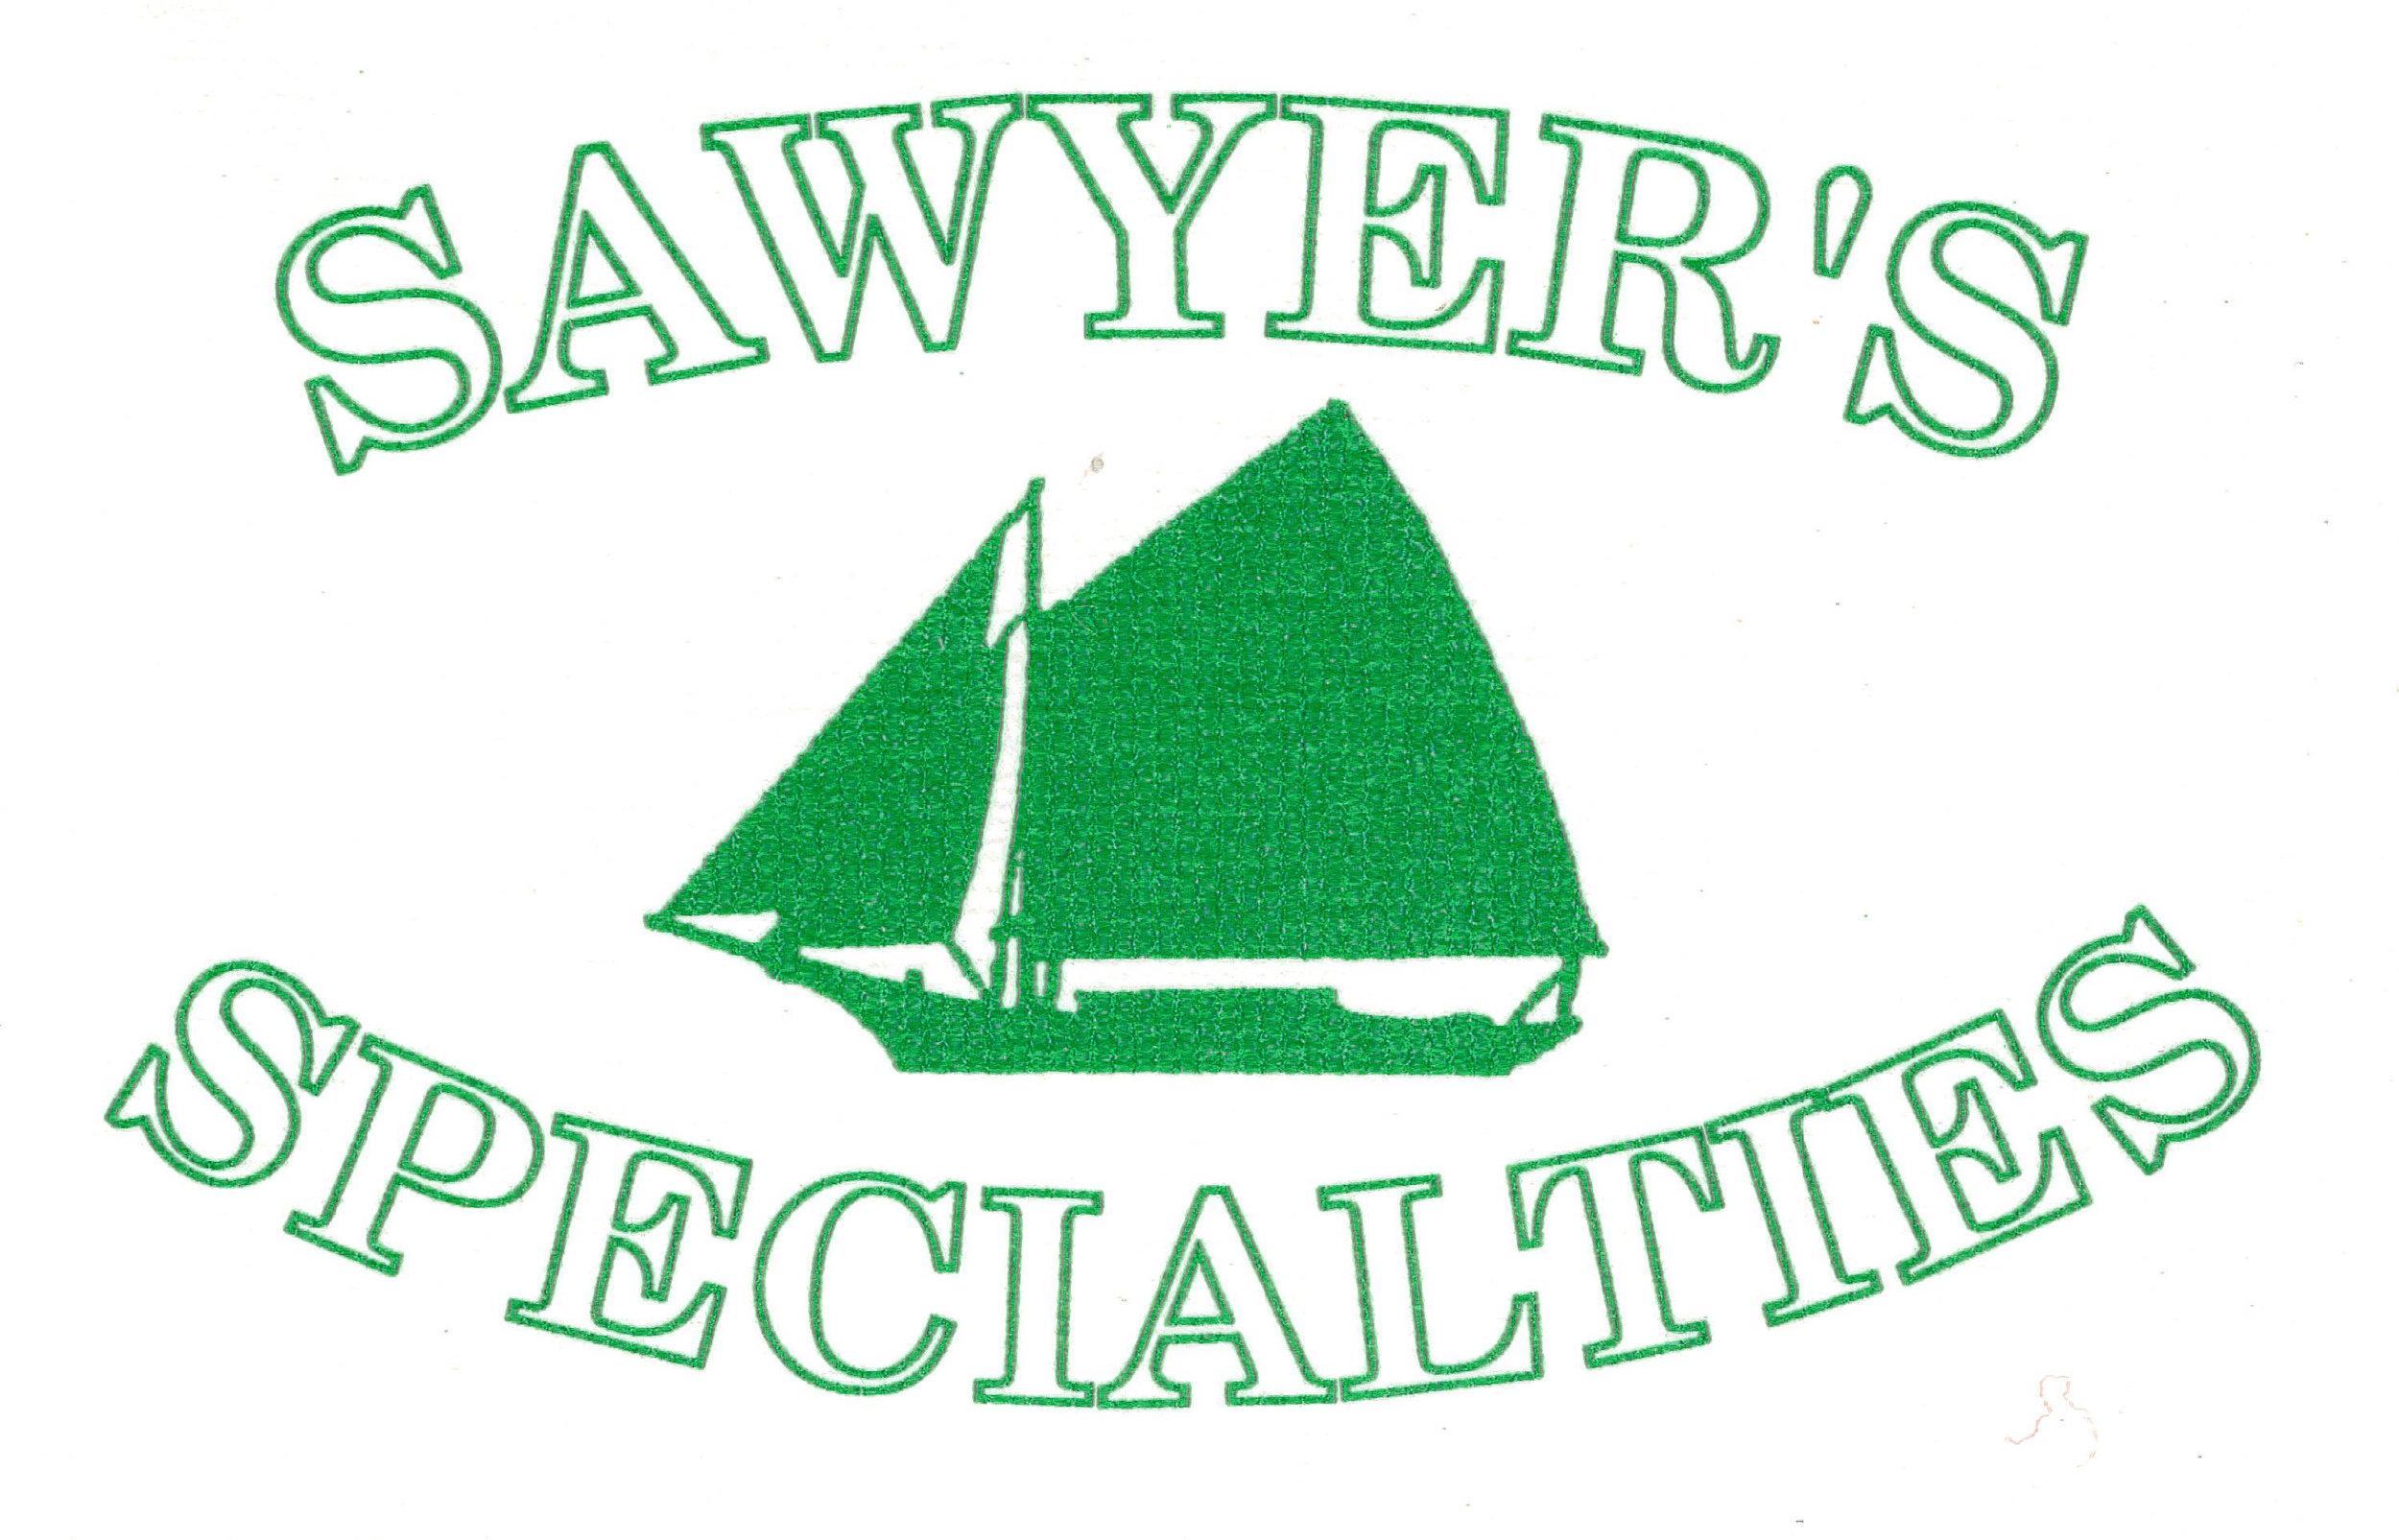 Sawyer logo 002.jpg